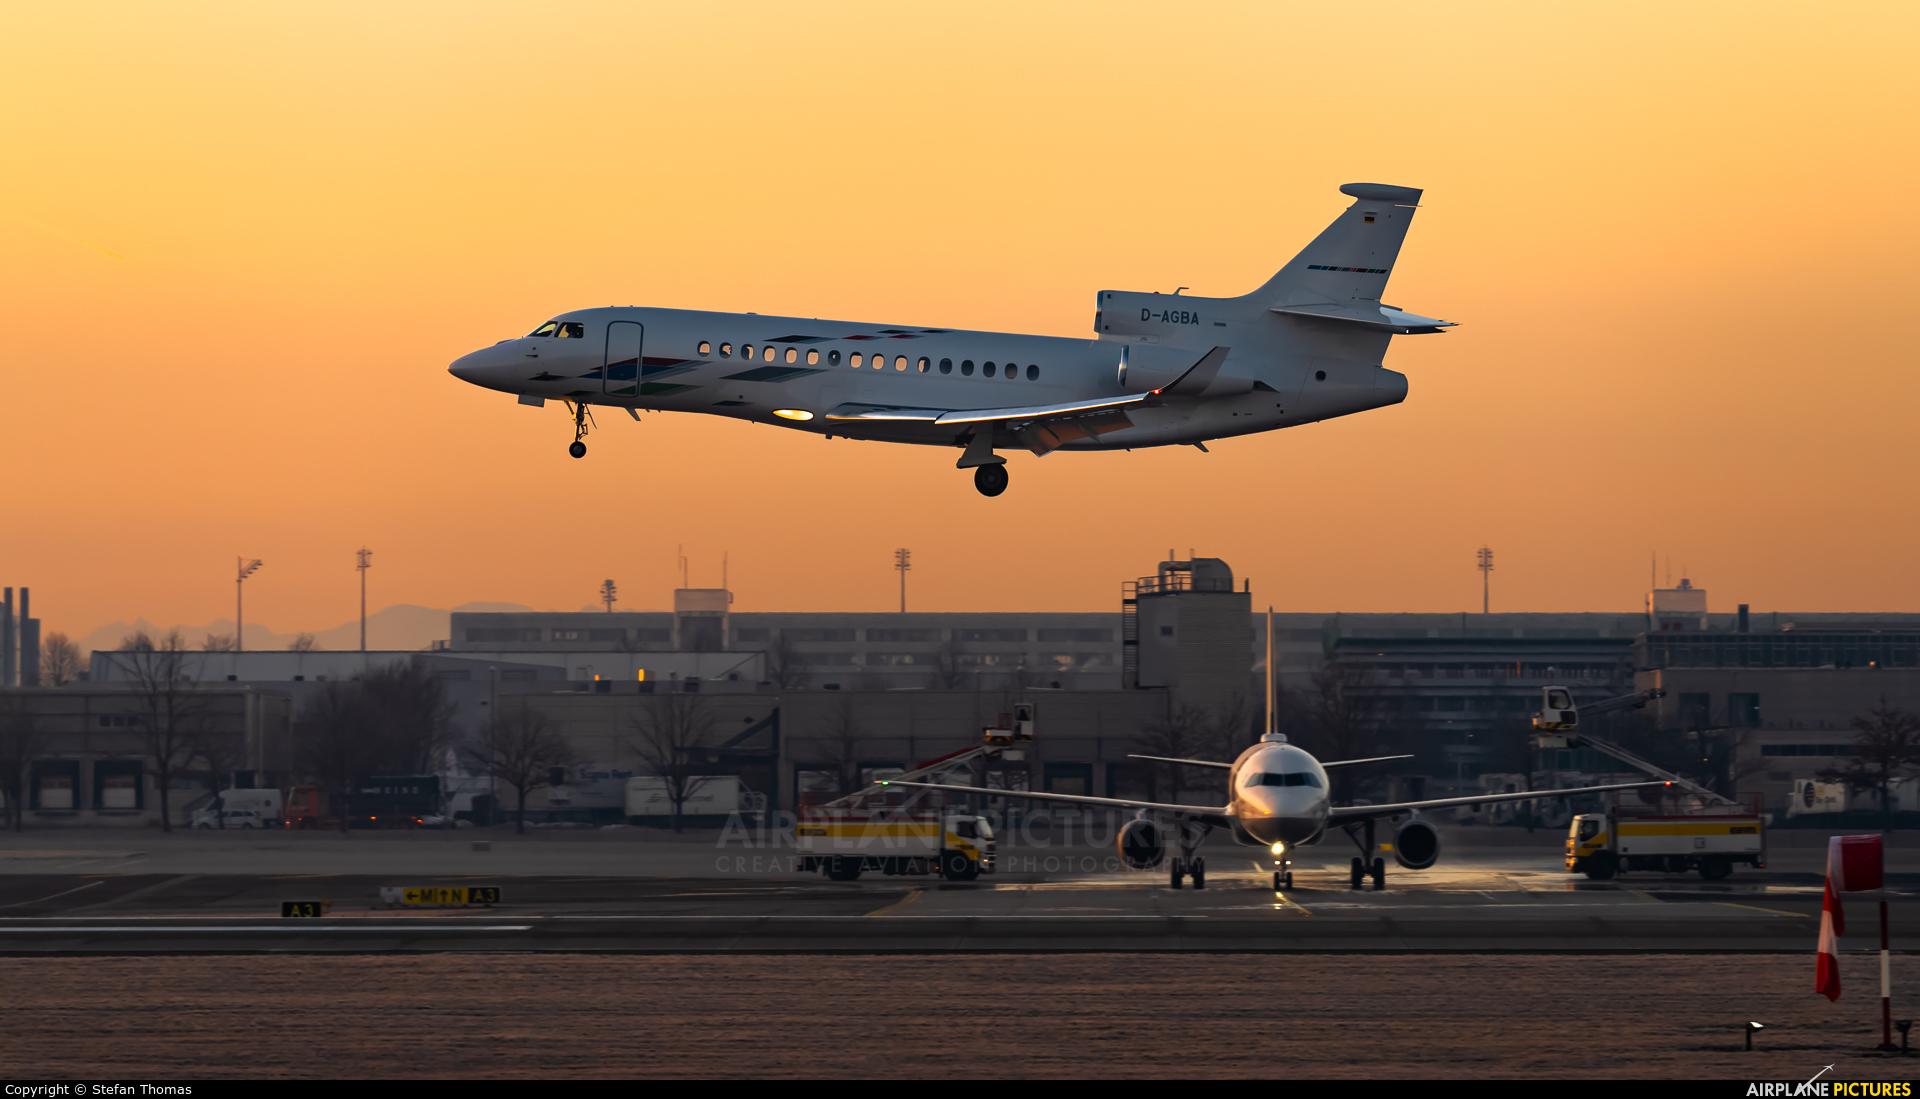 Volkswagen Air Services D-AGBA aircraft at Munich